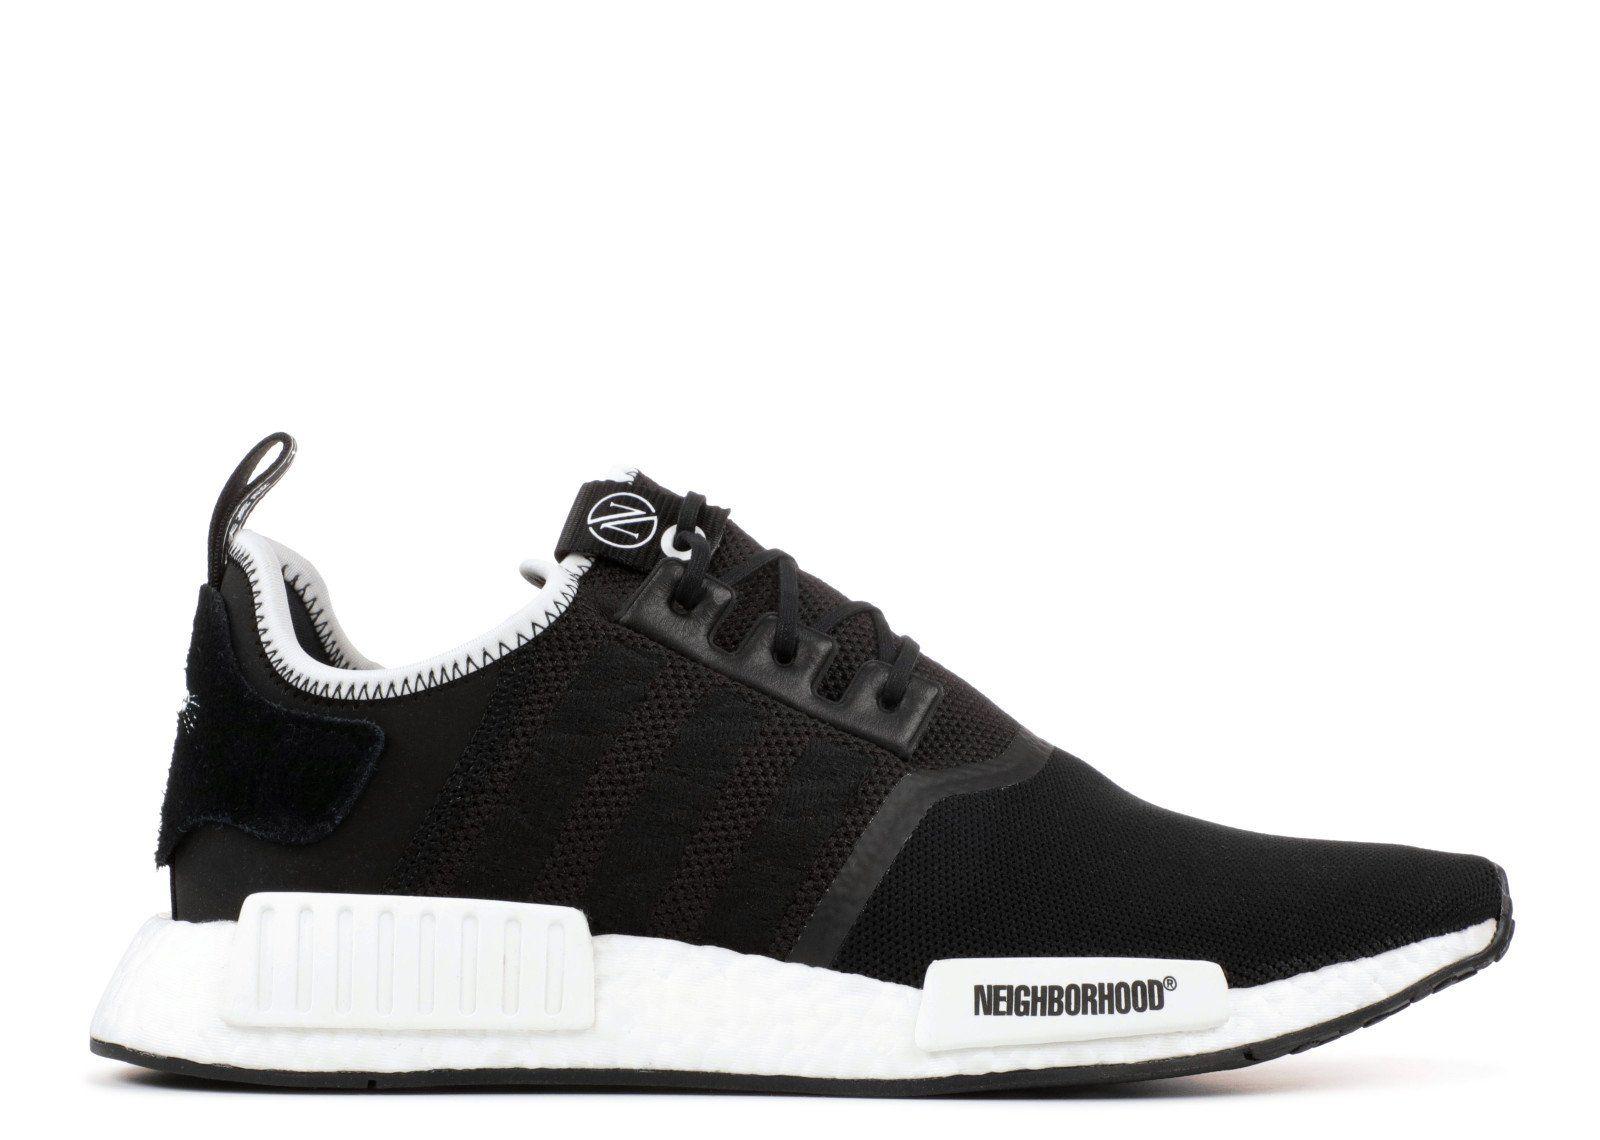 bc1e9aec17221 Adidas NMD R1 Champs Exclusive Sand Black White Cq0760 Fashion Shoe ...